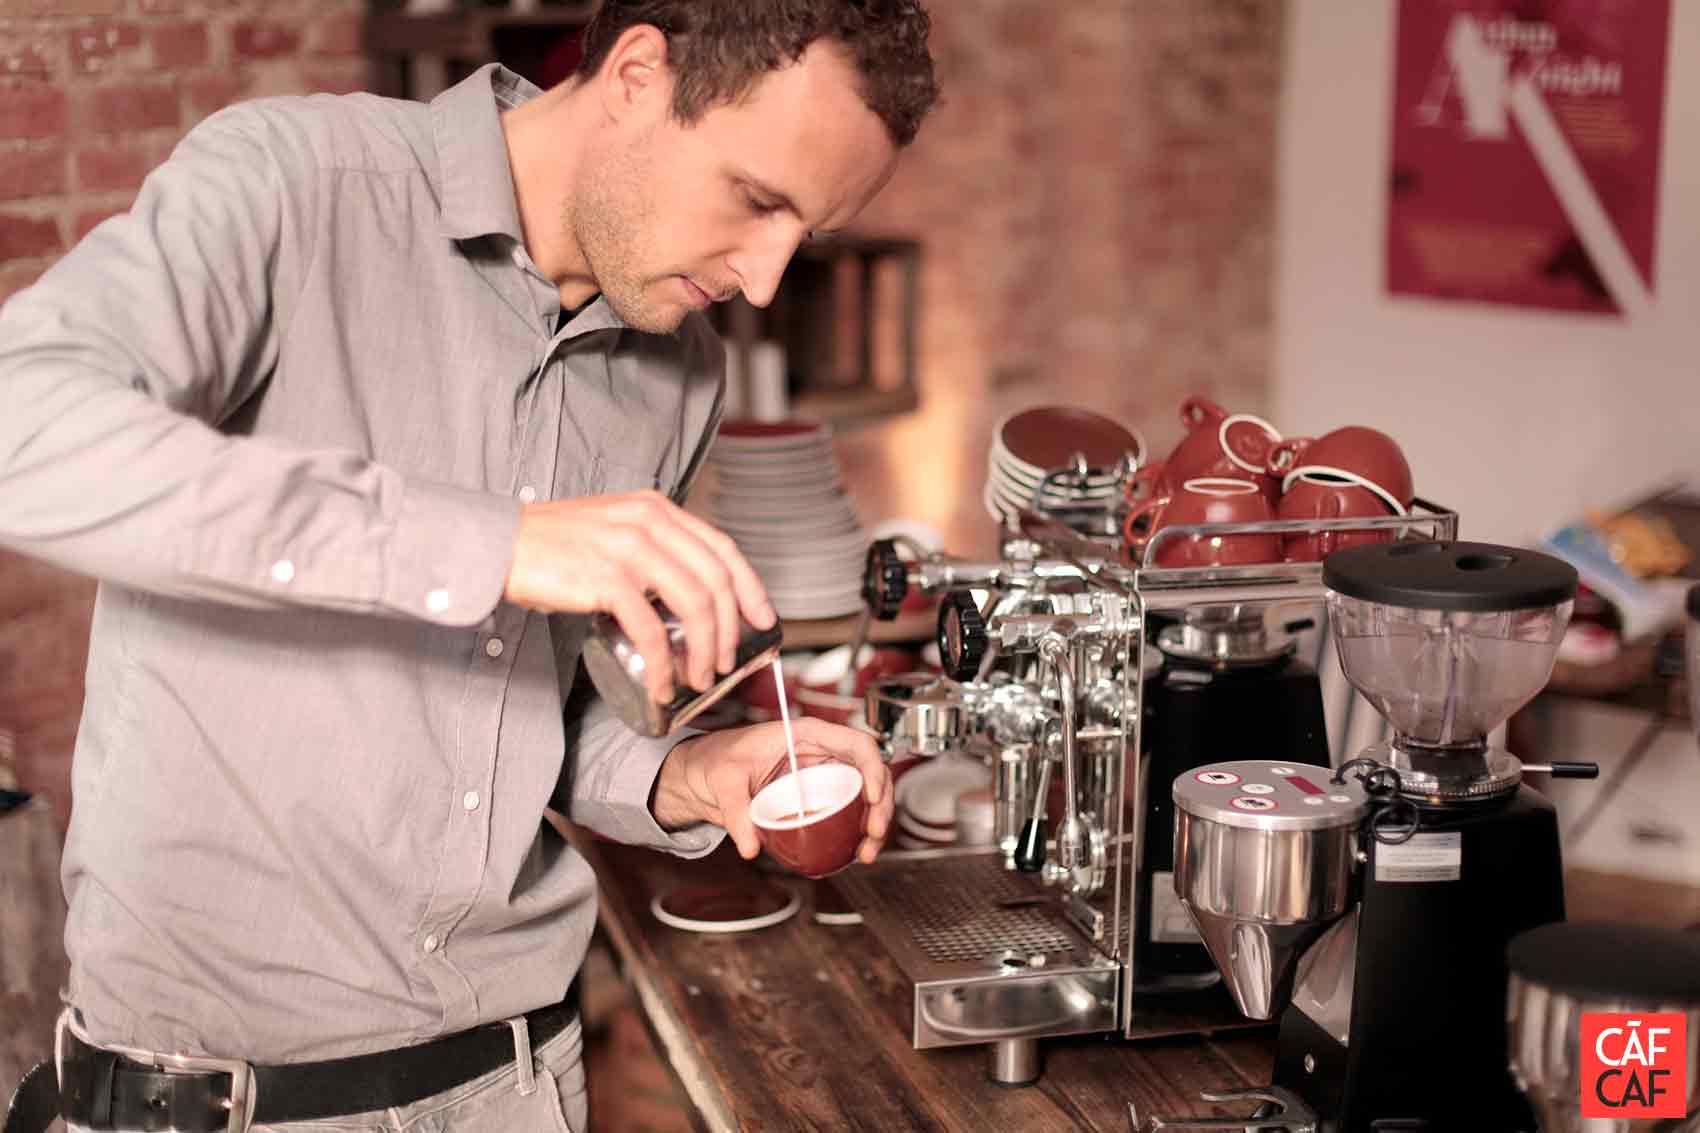 CafCaf.de – Kaffee & Blog, Kaffeeblog